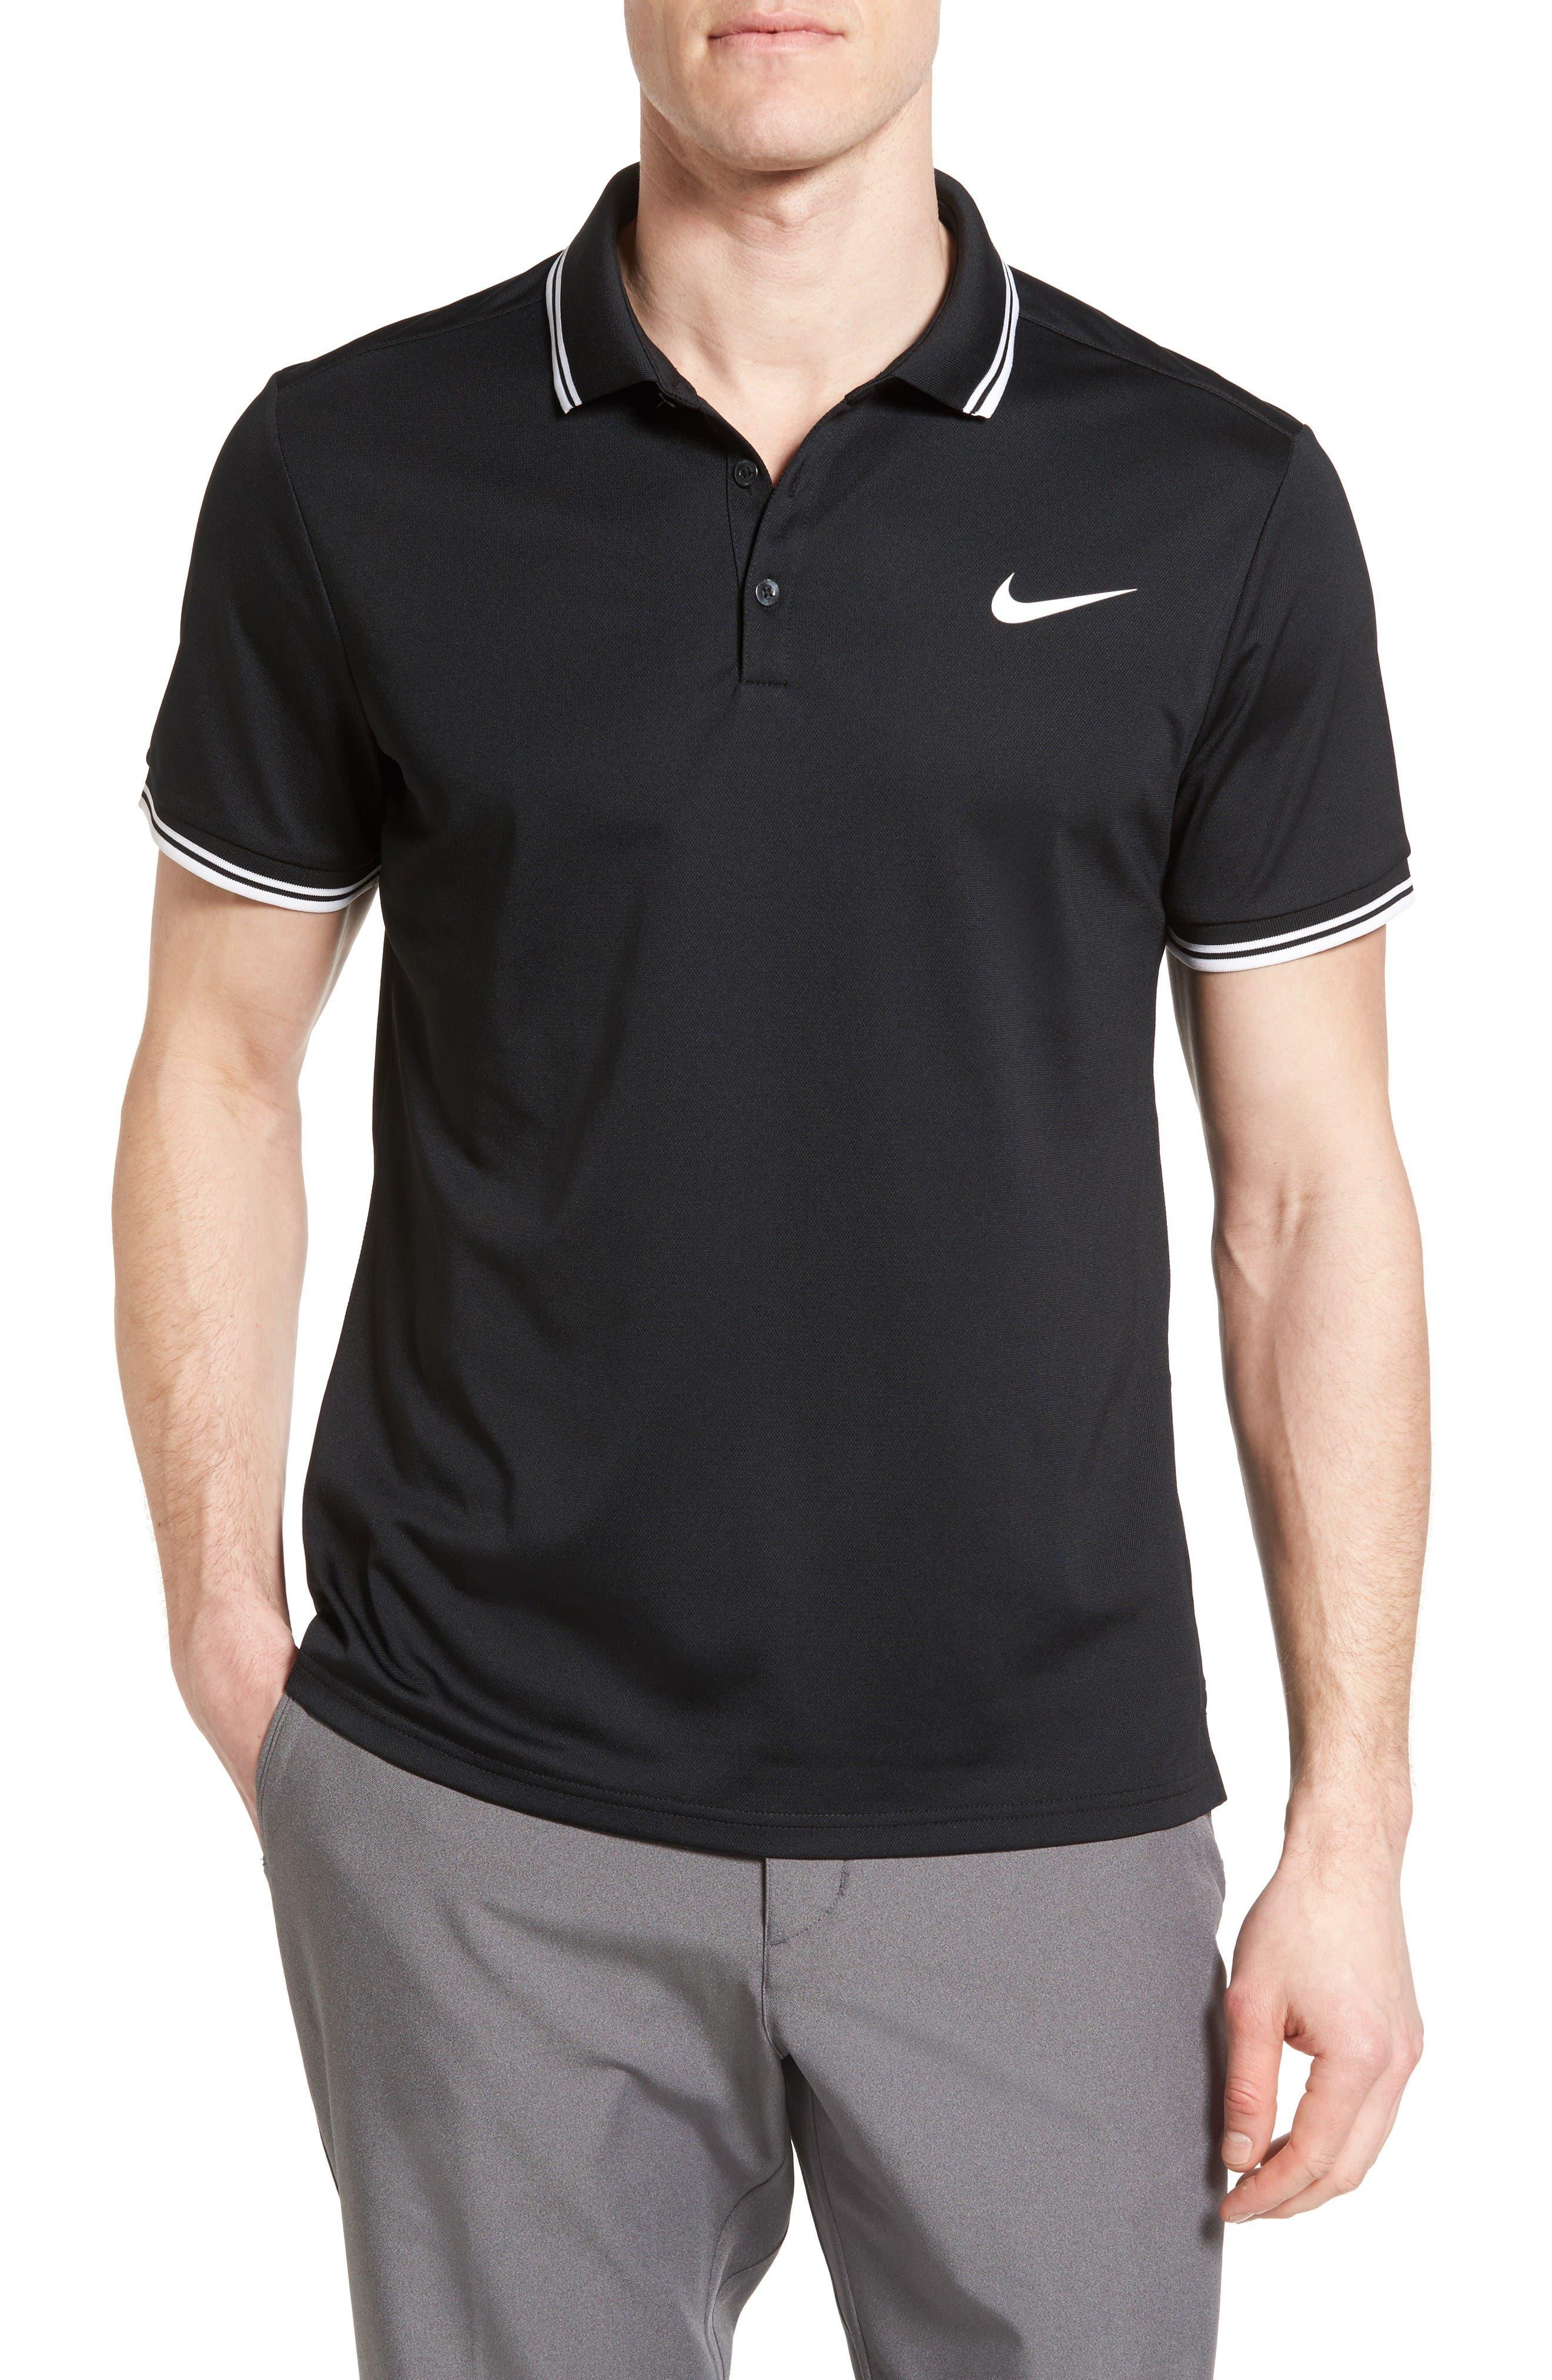 Nike Court Regular Fit Dri-FIT Tennis Polo